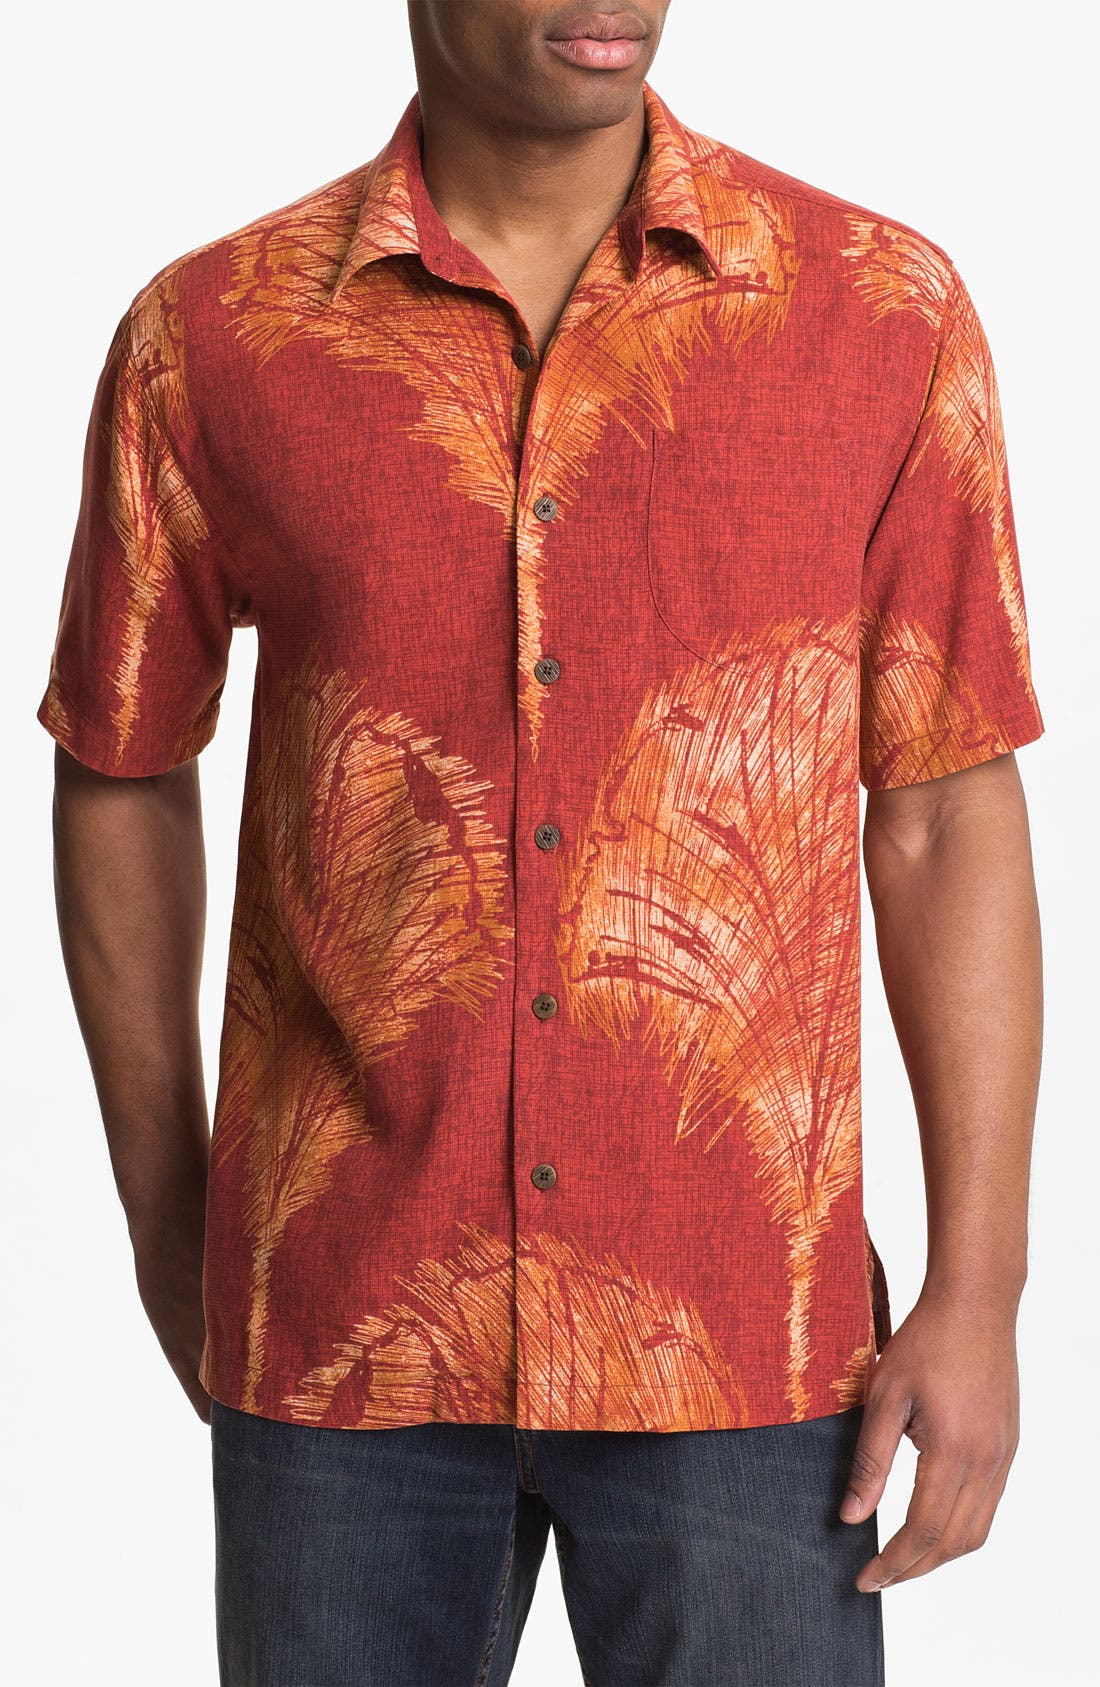 Main Image - Tommy Bahama 'Fanarama' Silk Campshirt